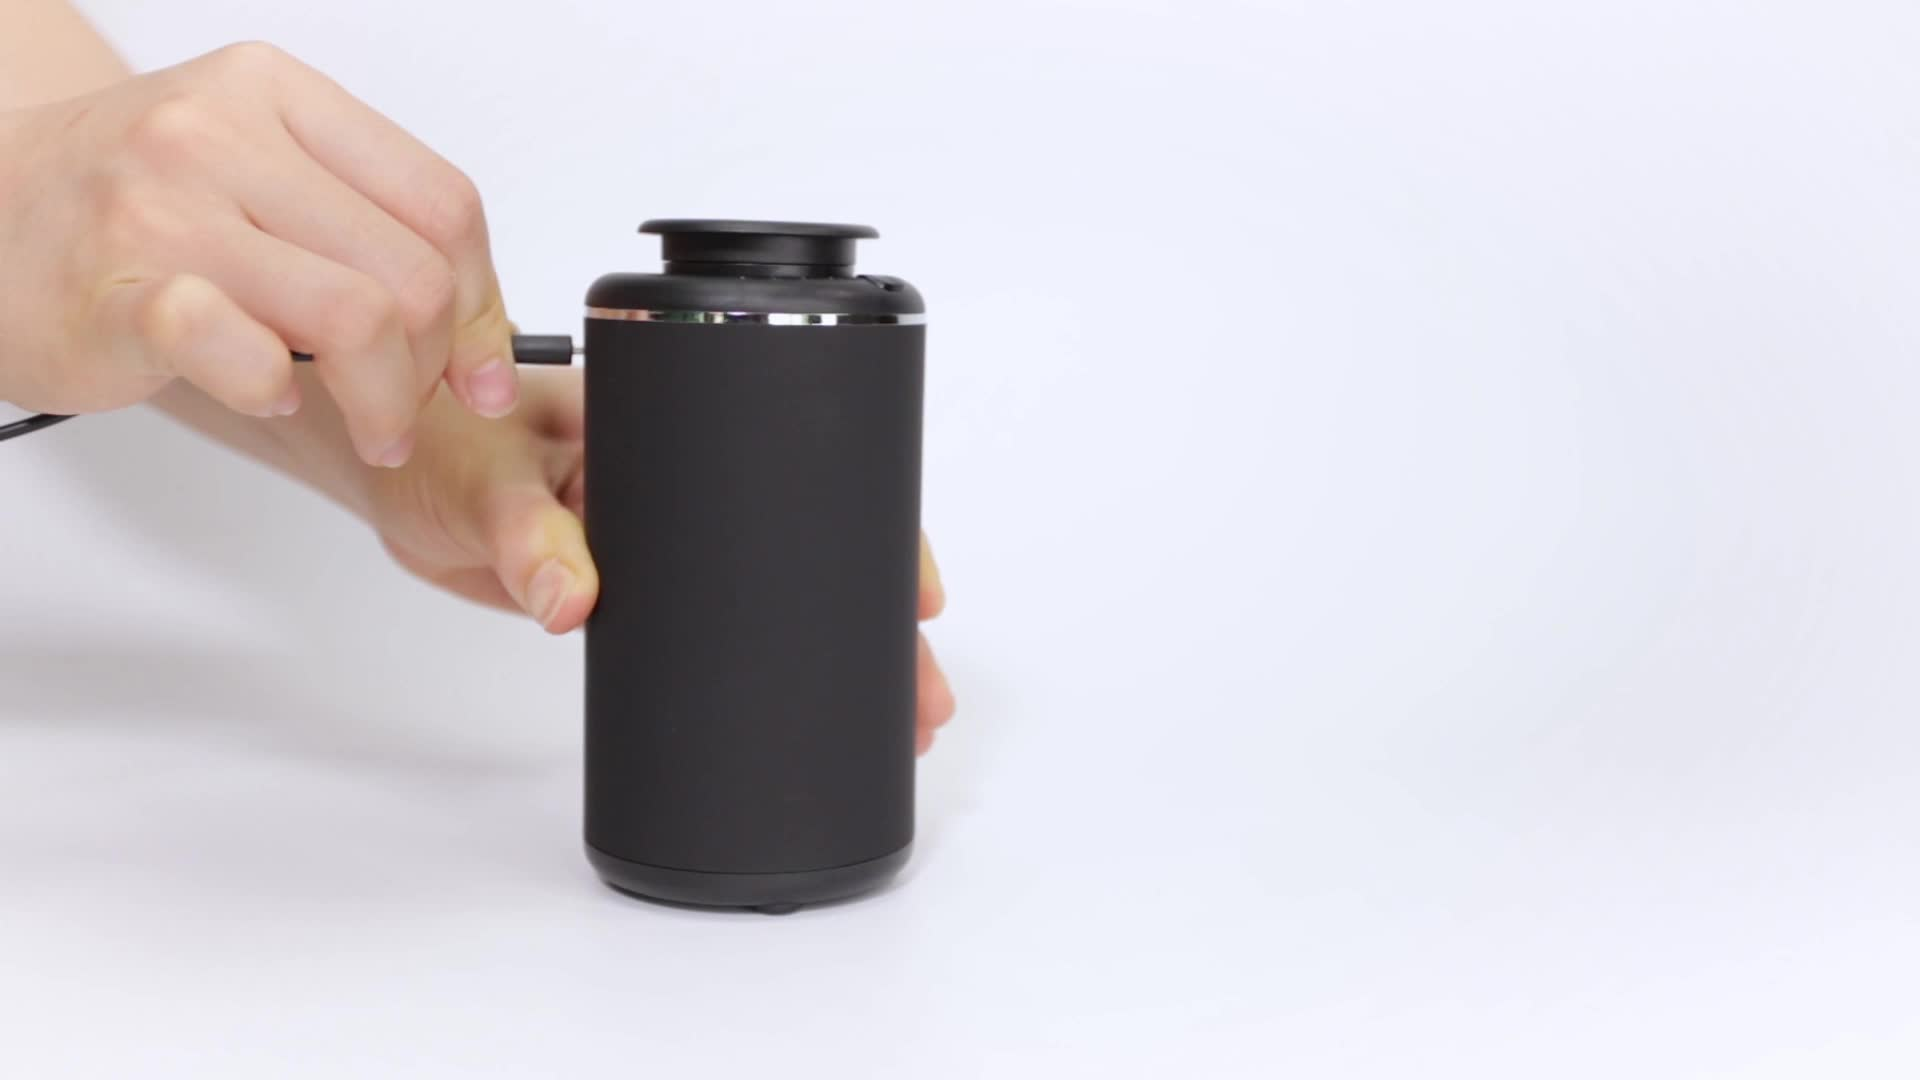 Scenta 2020 新カスタム高級アロマの車空気清浄リチウム電池